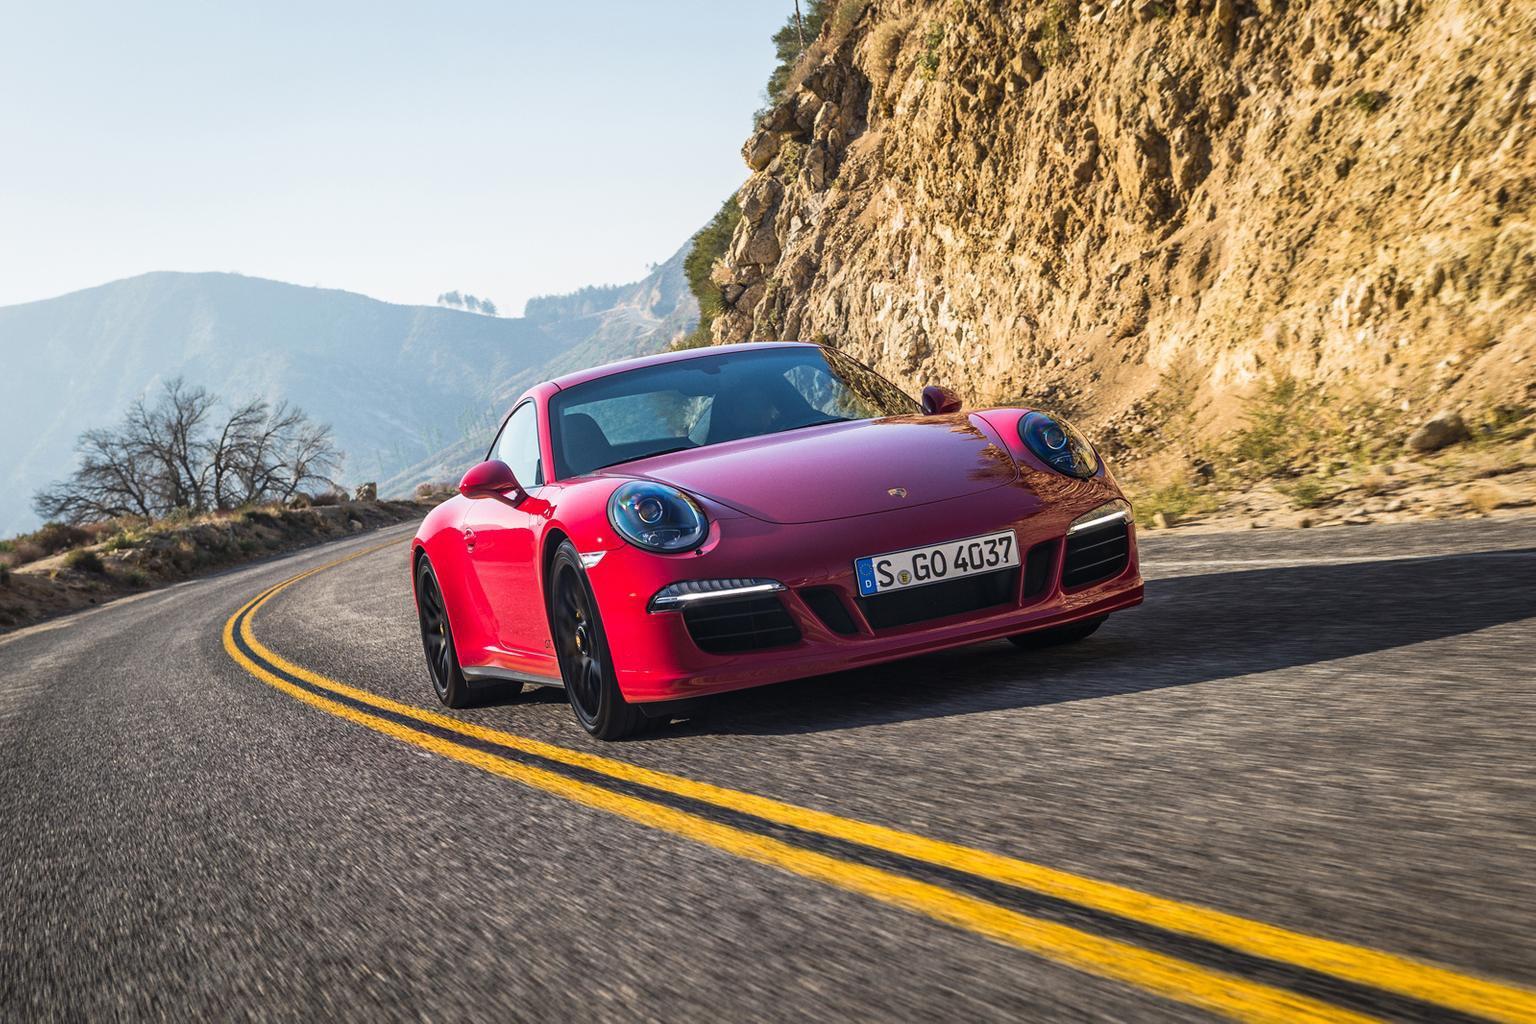 2015 Porsche 911 Carrera GTS review